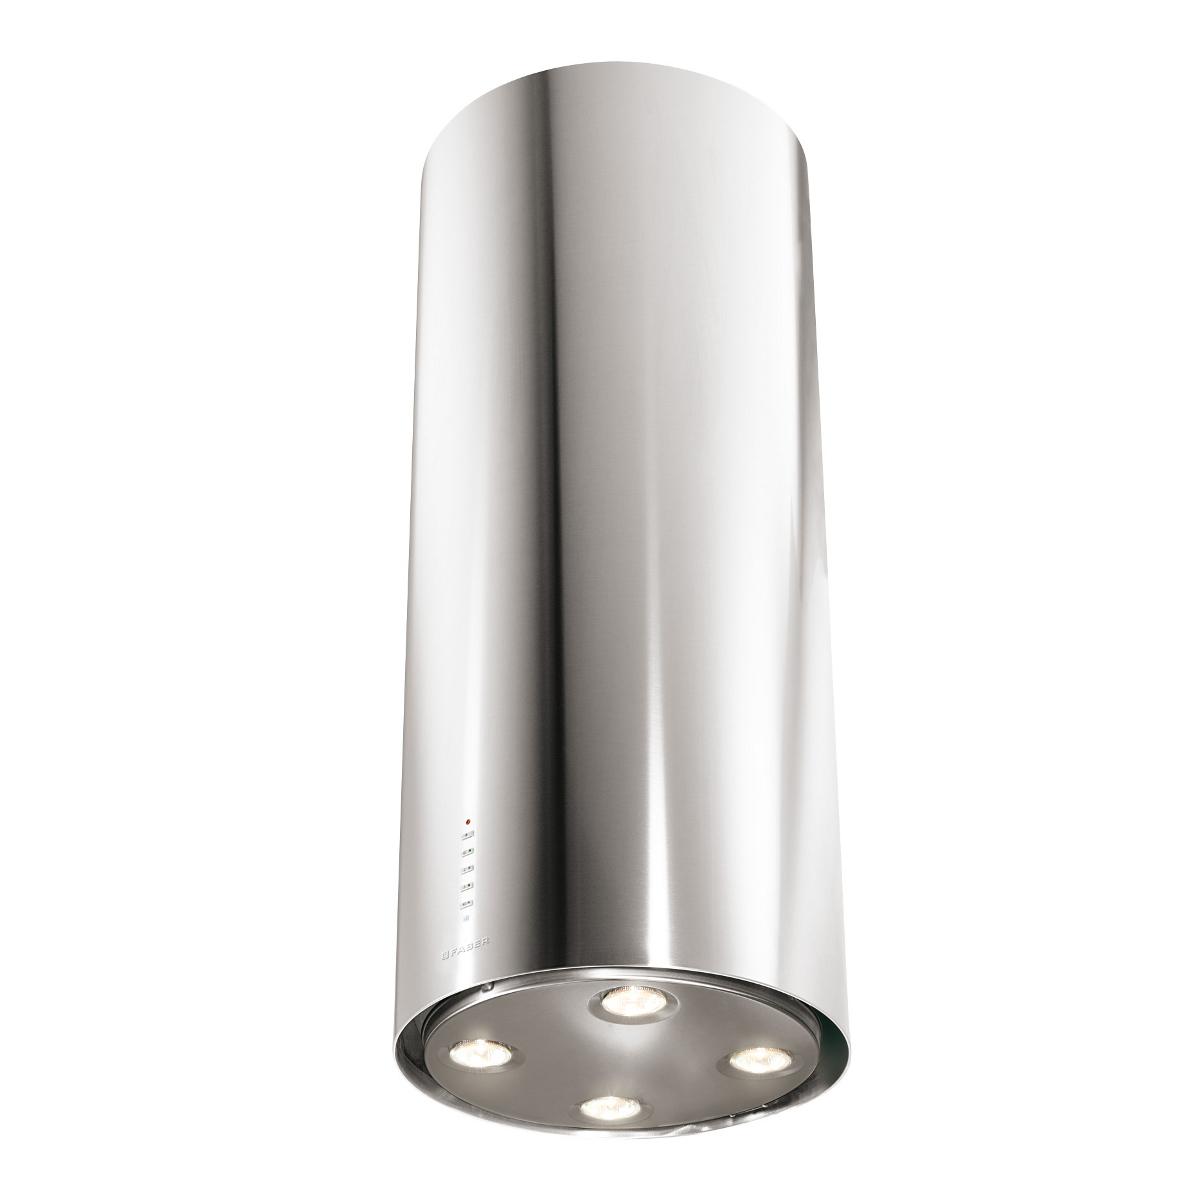 Faber Cylindra Isola EG8 X A37